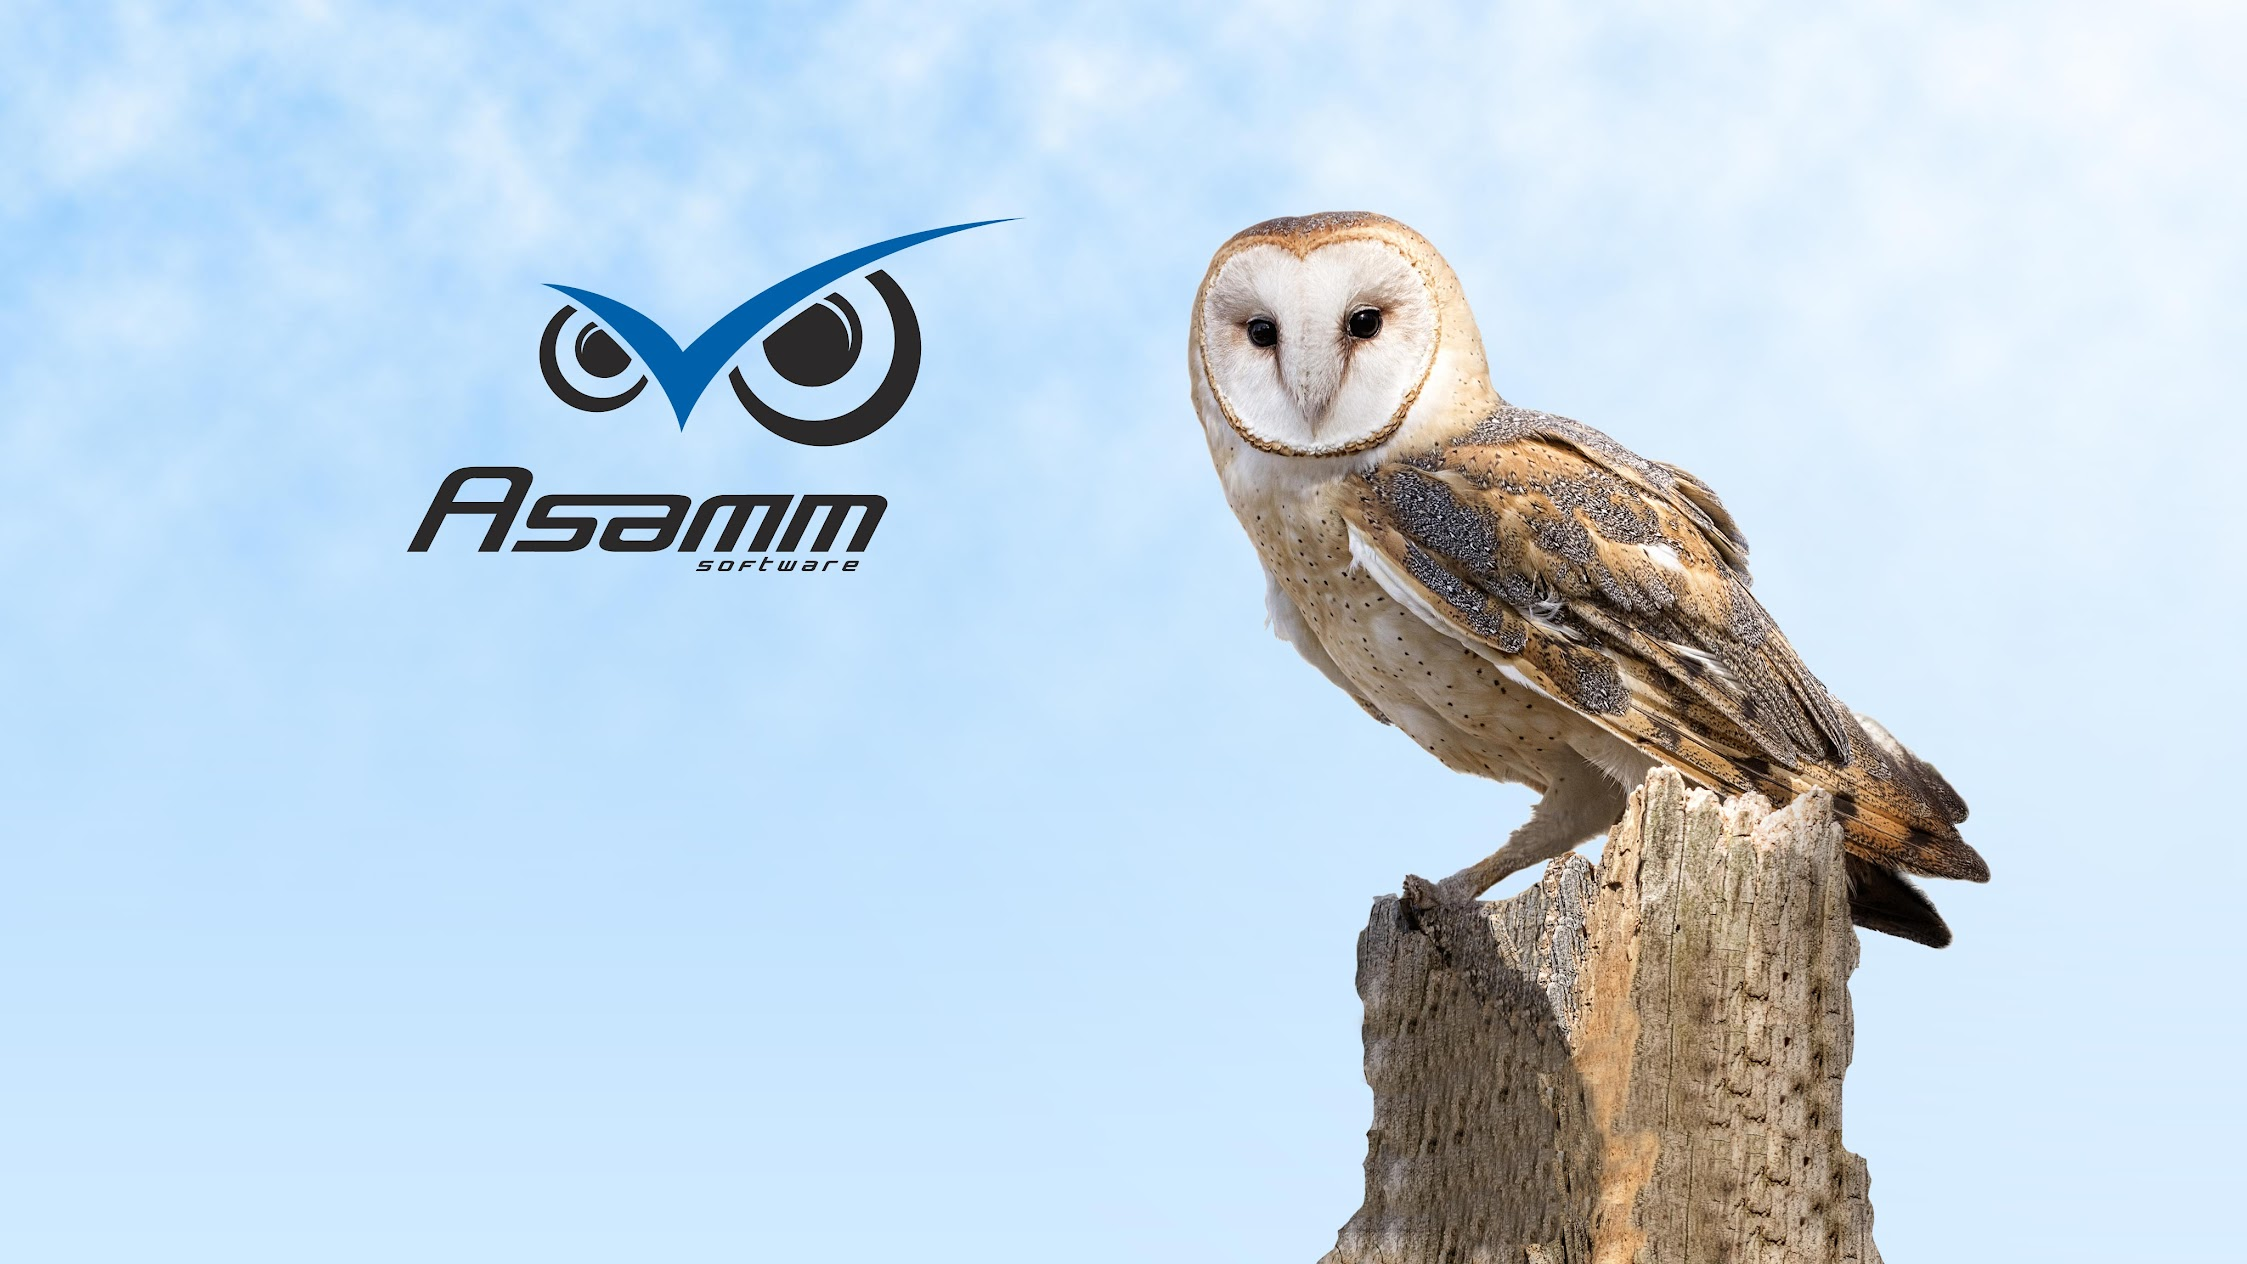 Asamm Software, s. r. o.